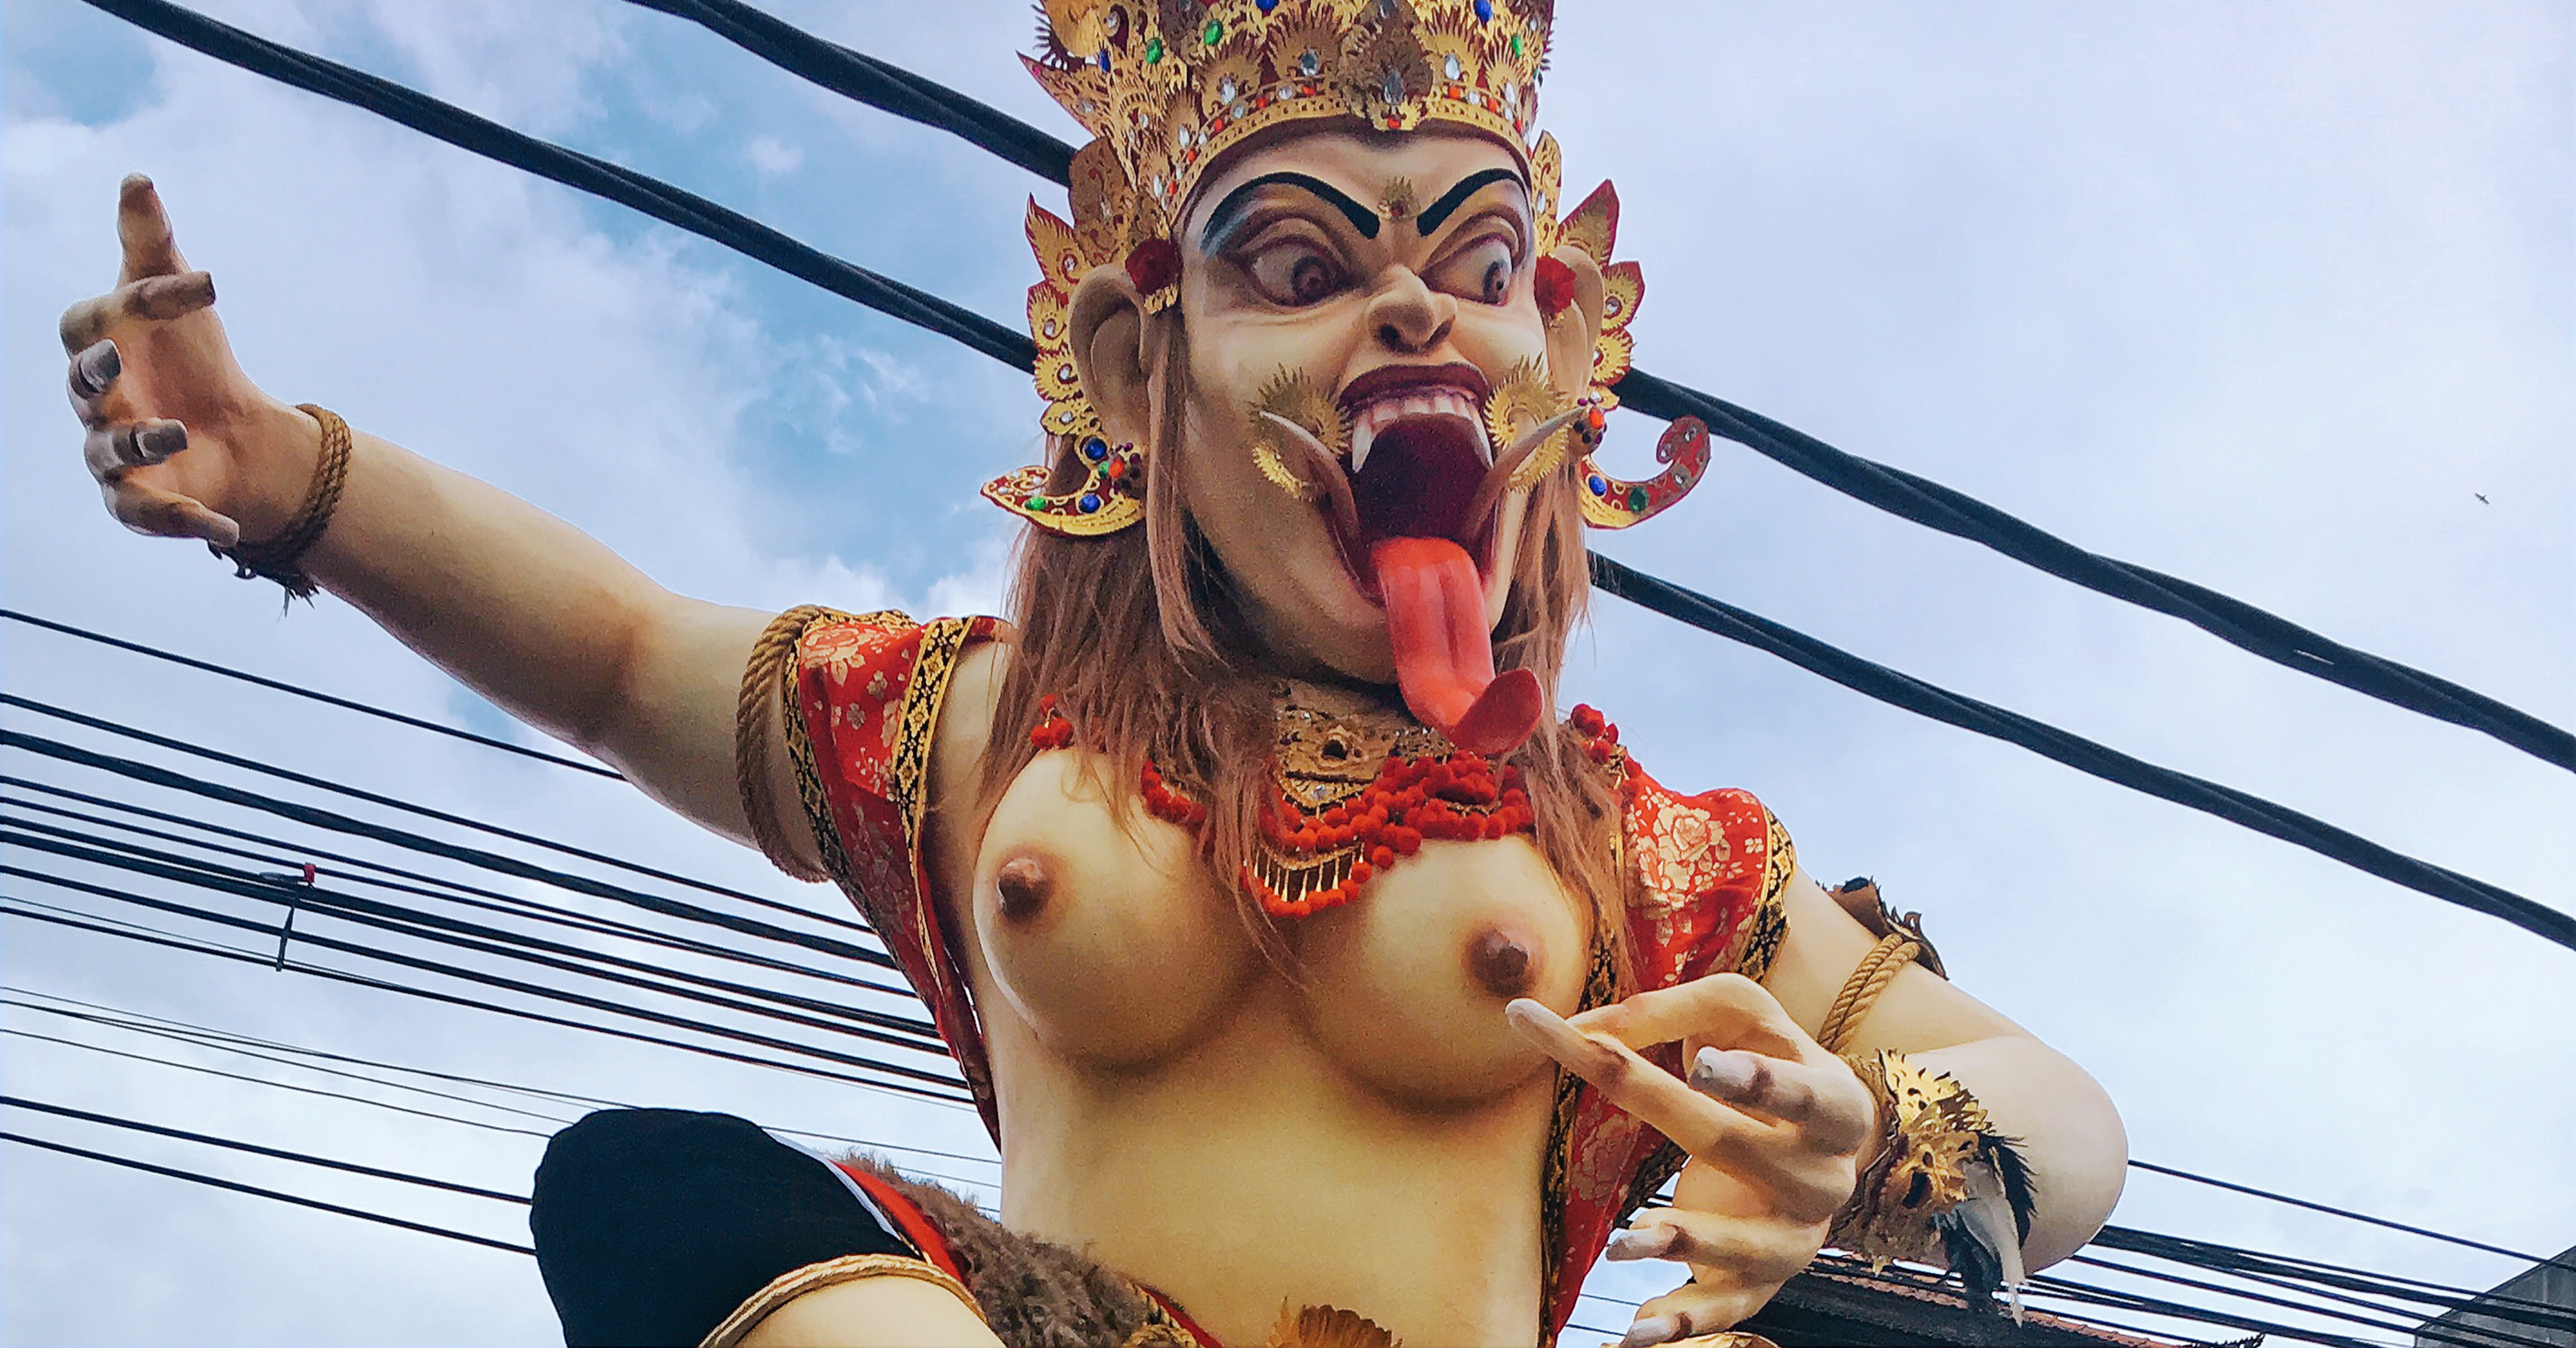 indonesia, bali, bukit, temple, ogo ogo, bali holidays, ceremony, индонезия, бали, букит, ого ого, парад, церемония, праздники бали